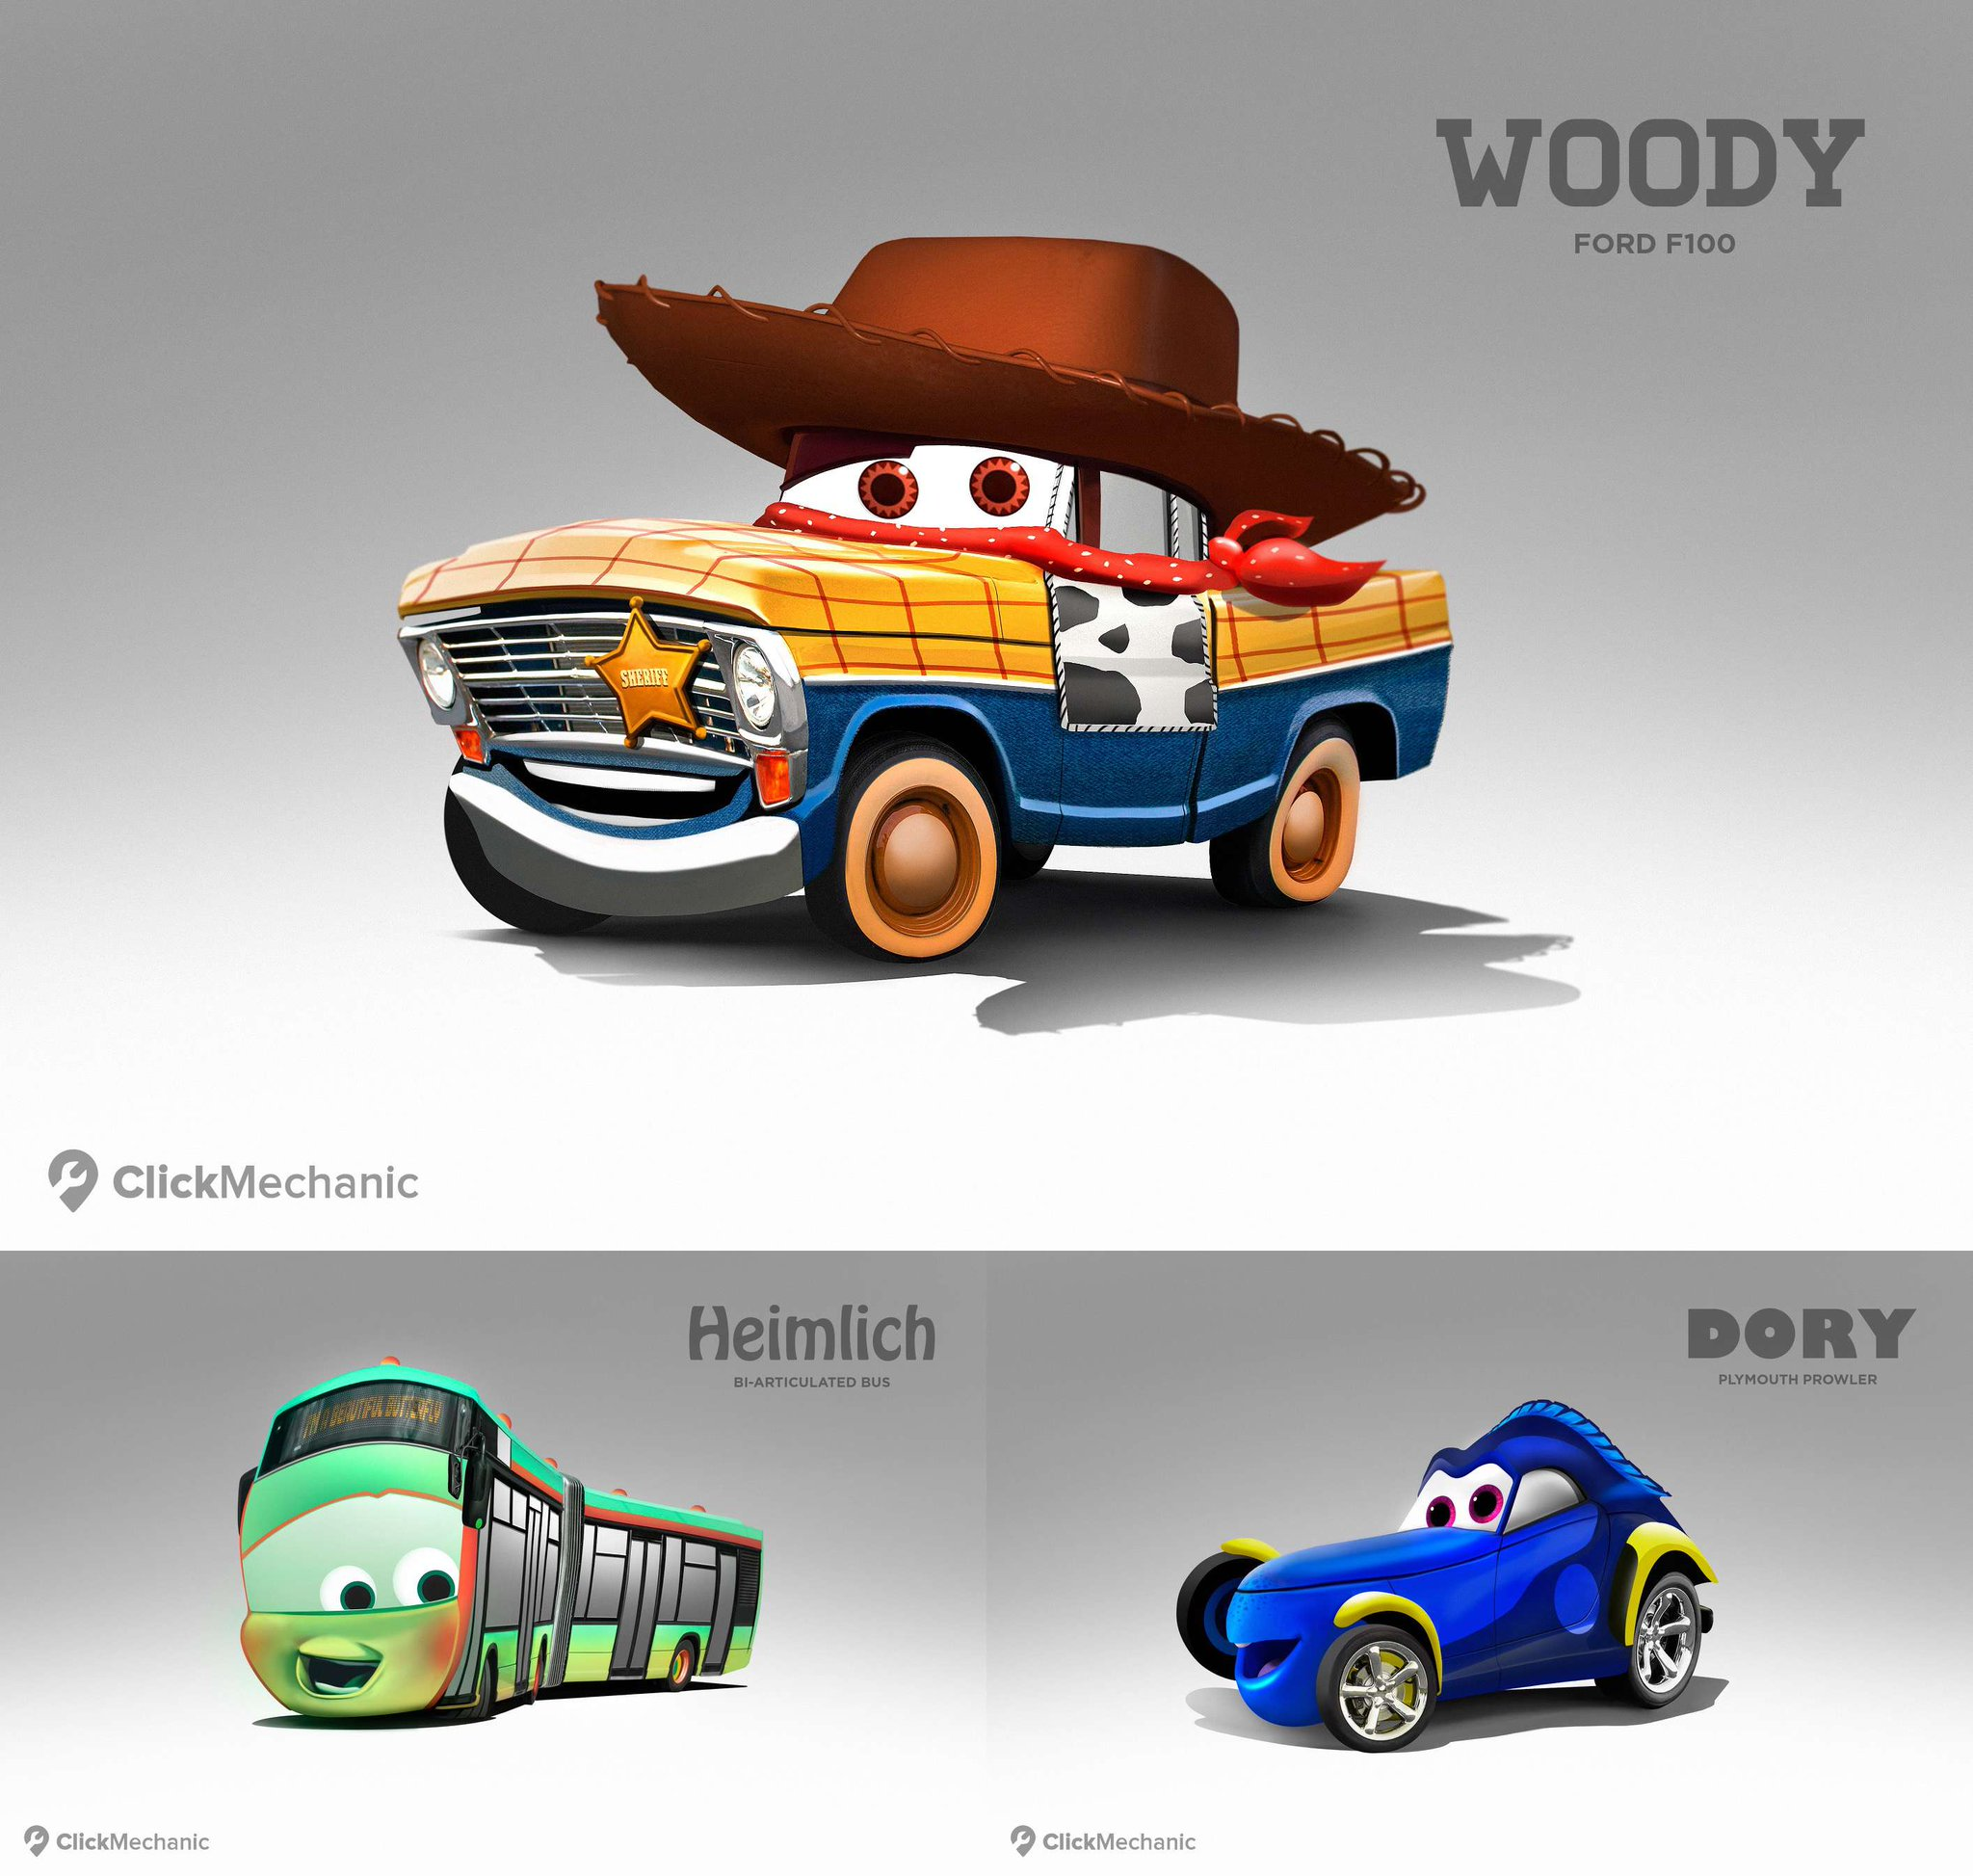 "Pixar Post On Twitter: ""Mr. Incredible, Heimlich, Woody"